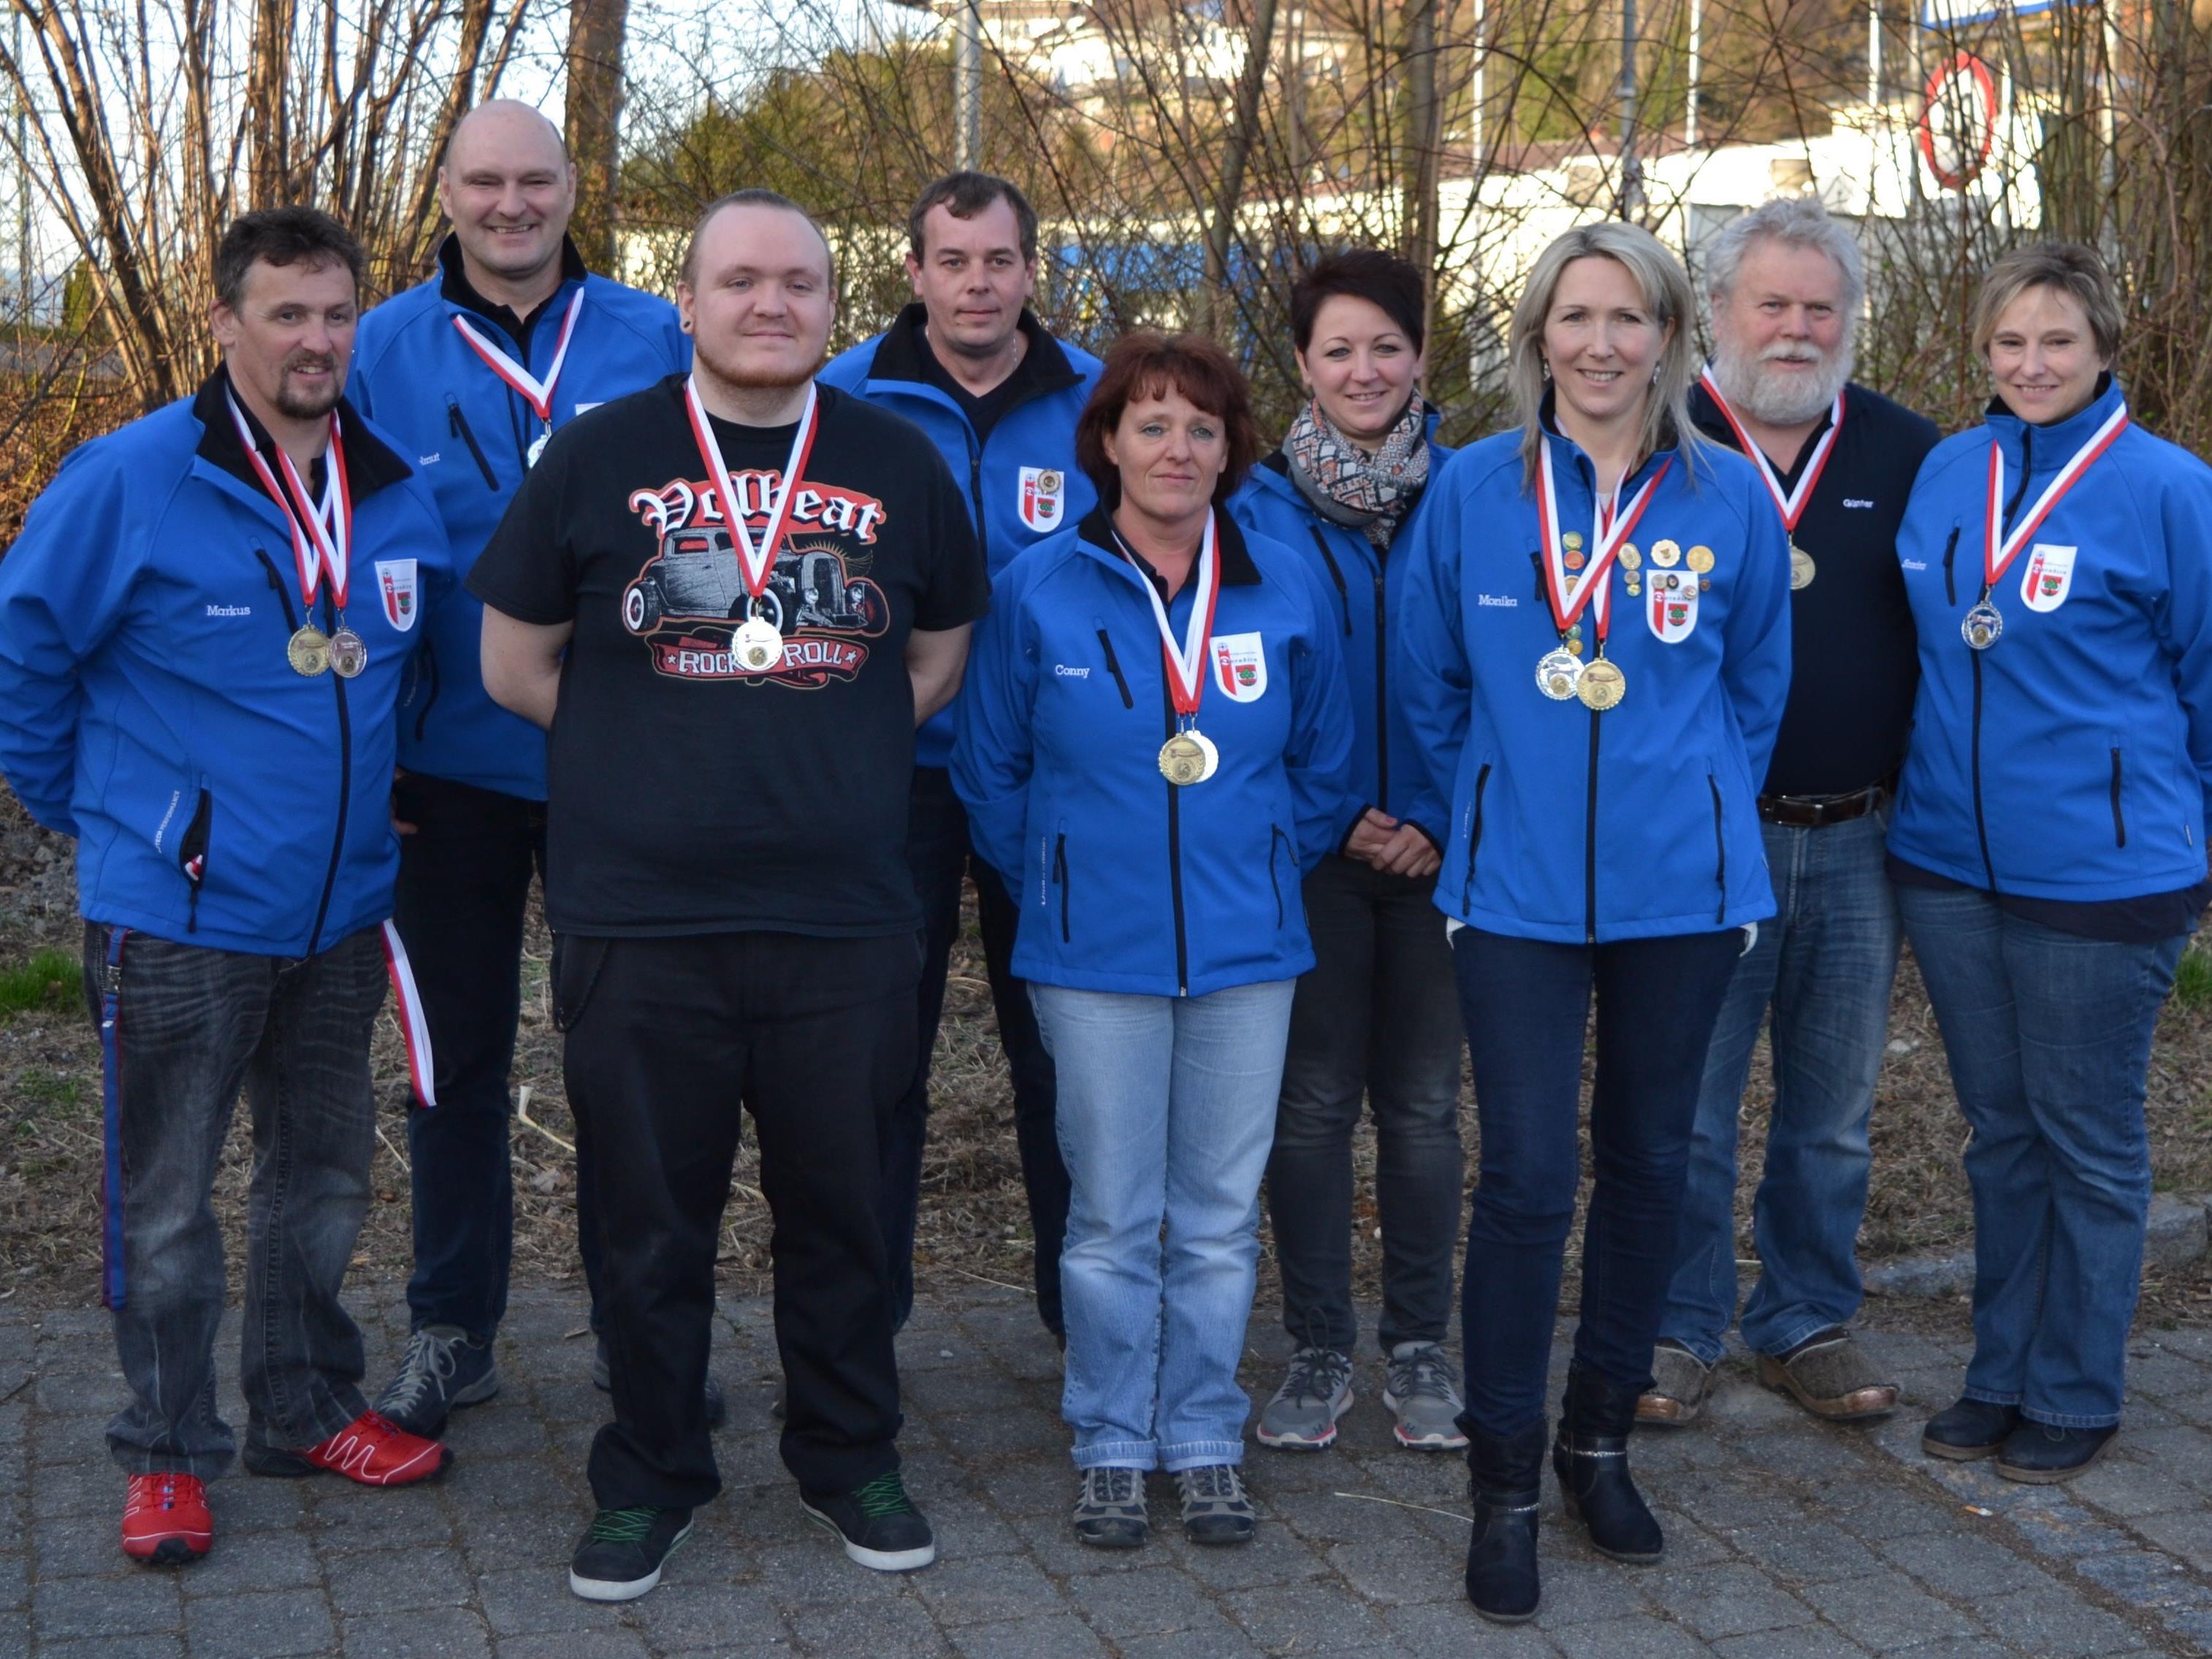 Markus,Helmut,Stefan,Loli,Günter,Sandra,Fabian,Conny,Monika